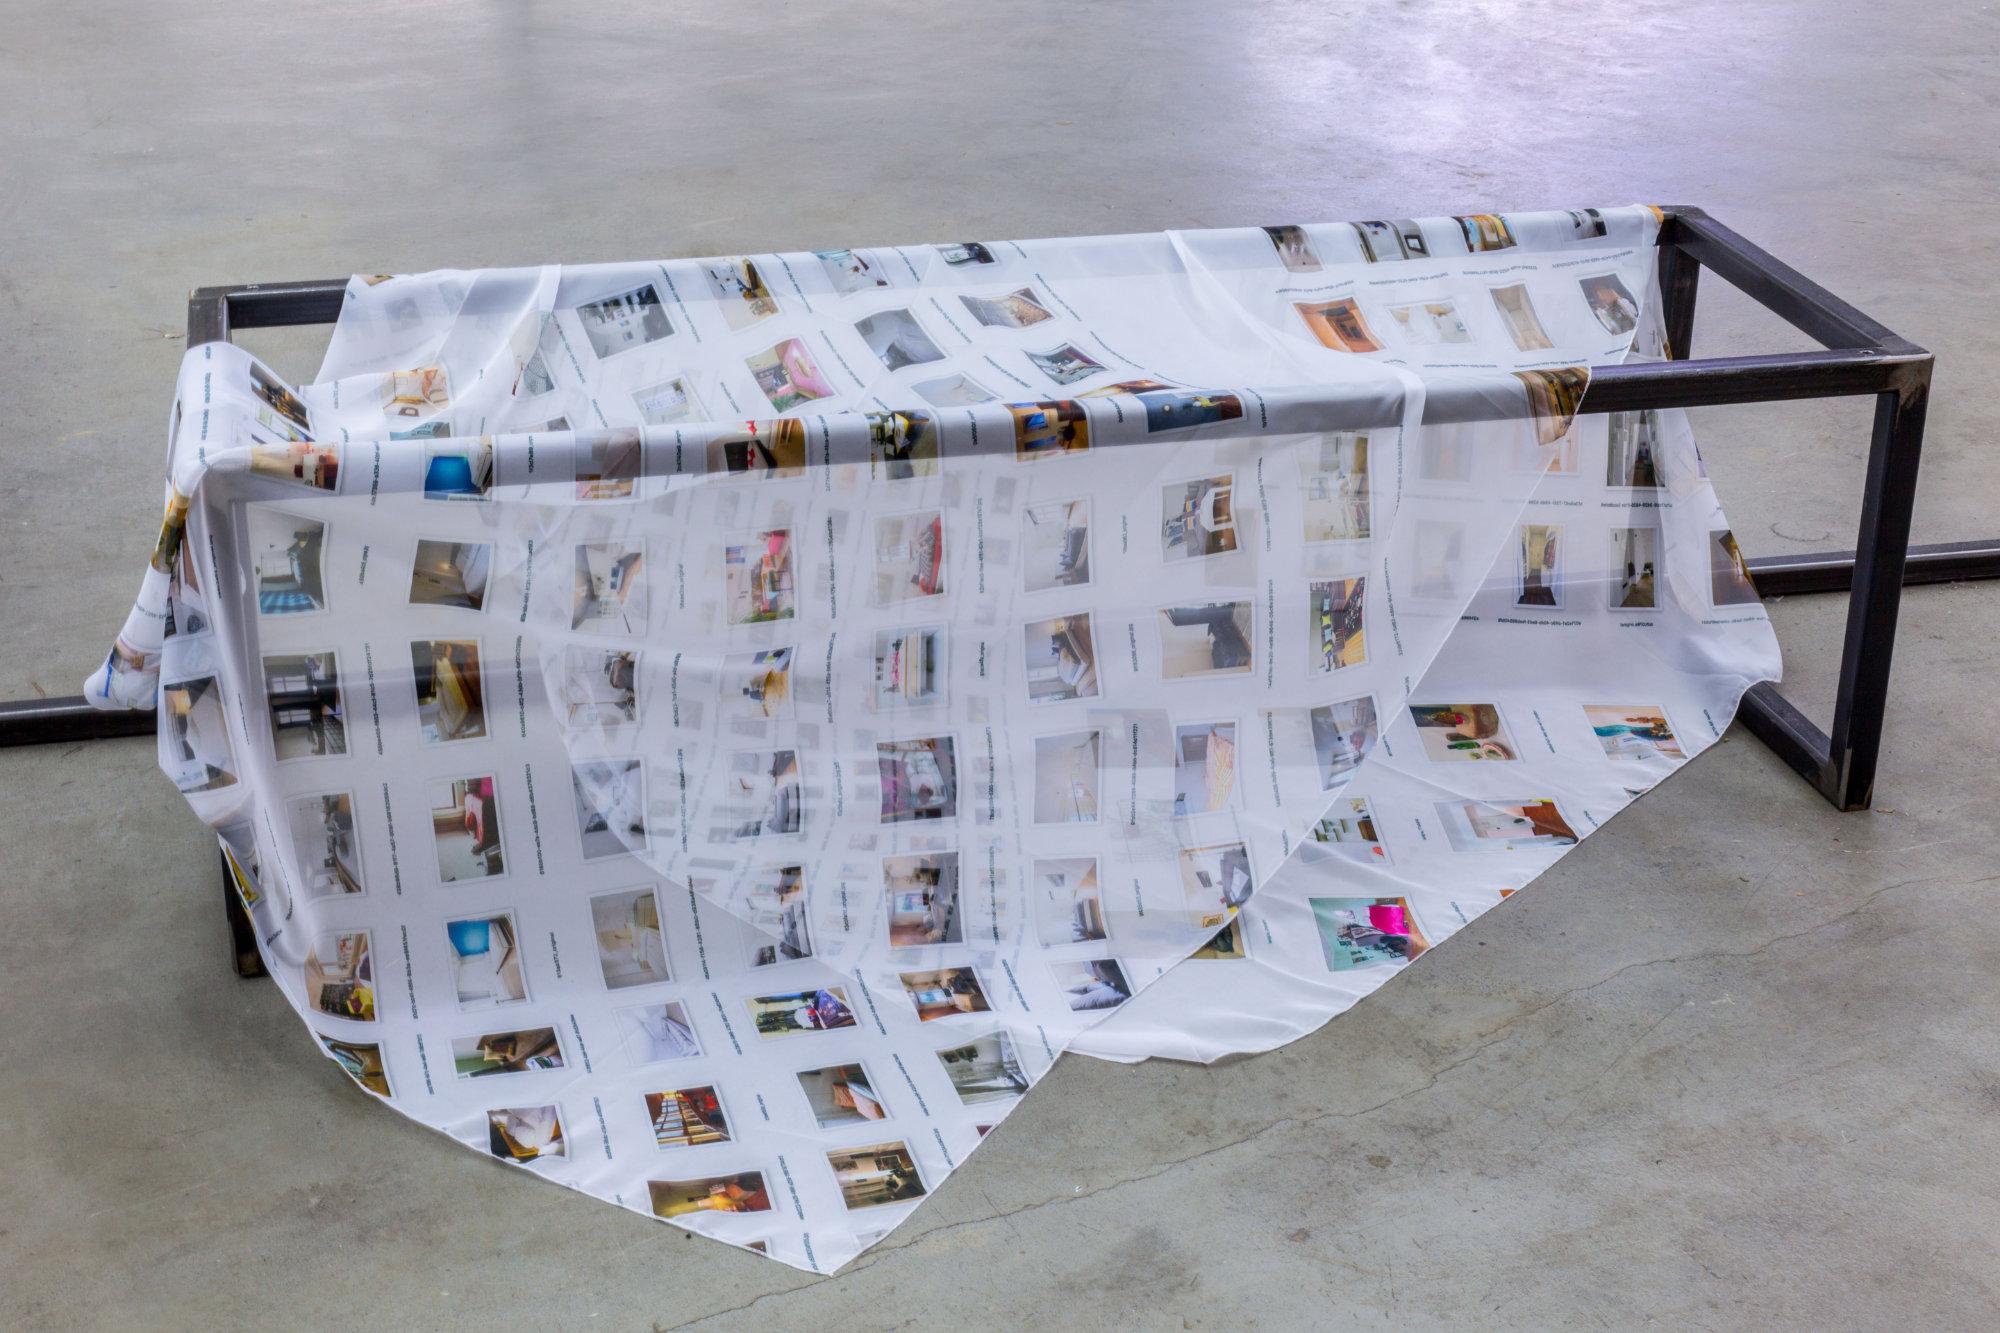 <p>Installationsansicht Lorenzo Sandoval, Foto: Anastasia Muna</p>